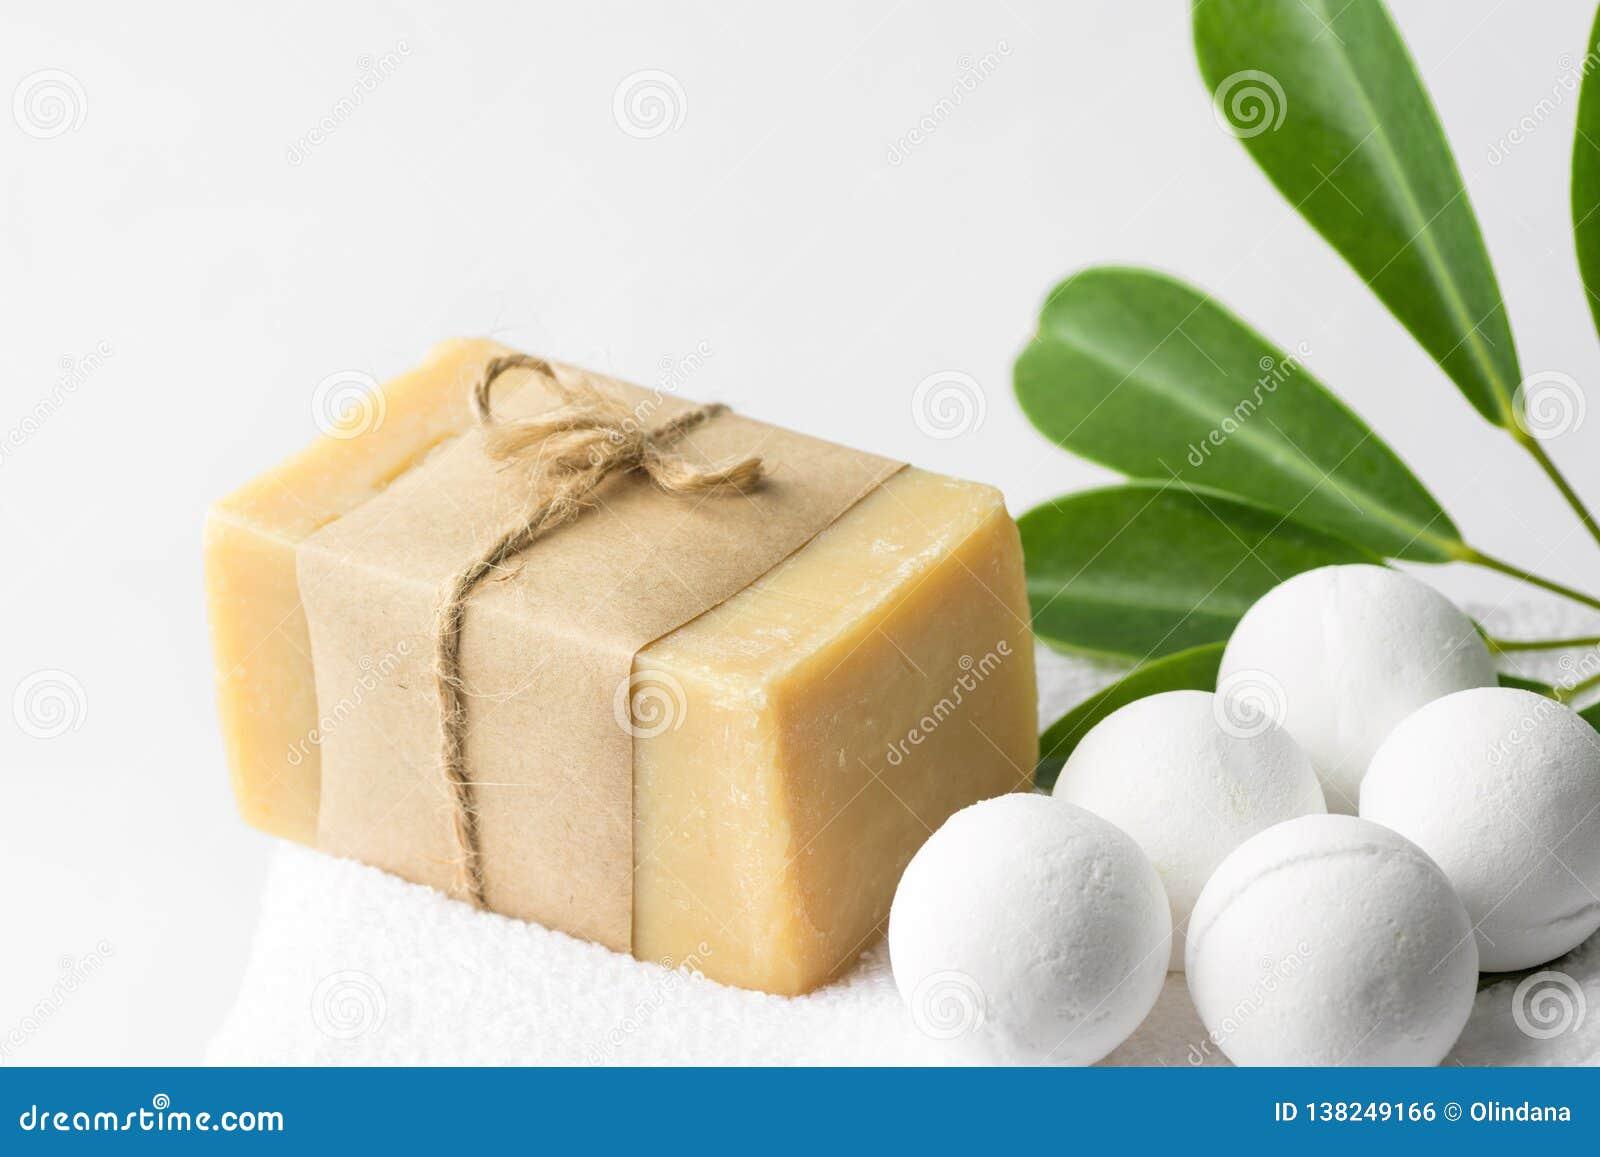 Handmade Salt Bath Bombs In Balls Shape From Organic Vegan